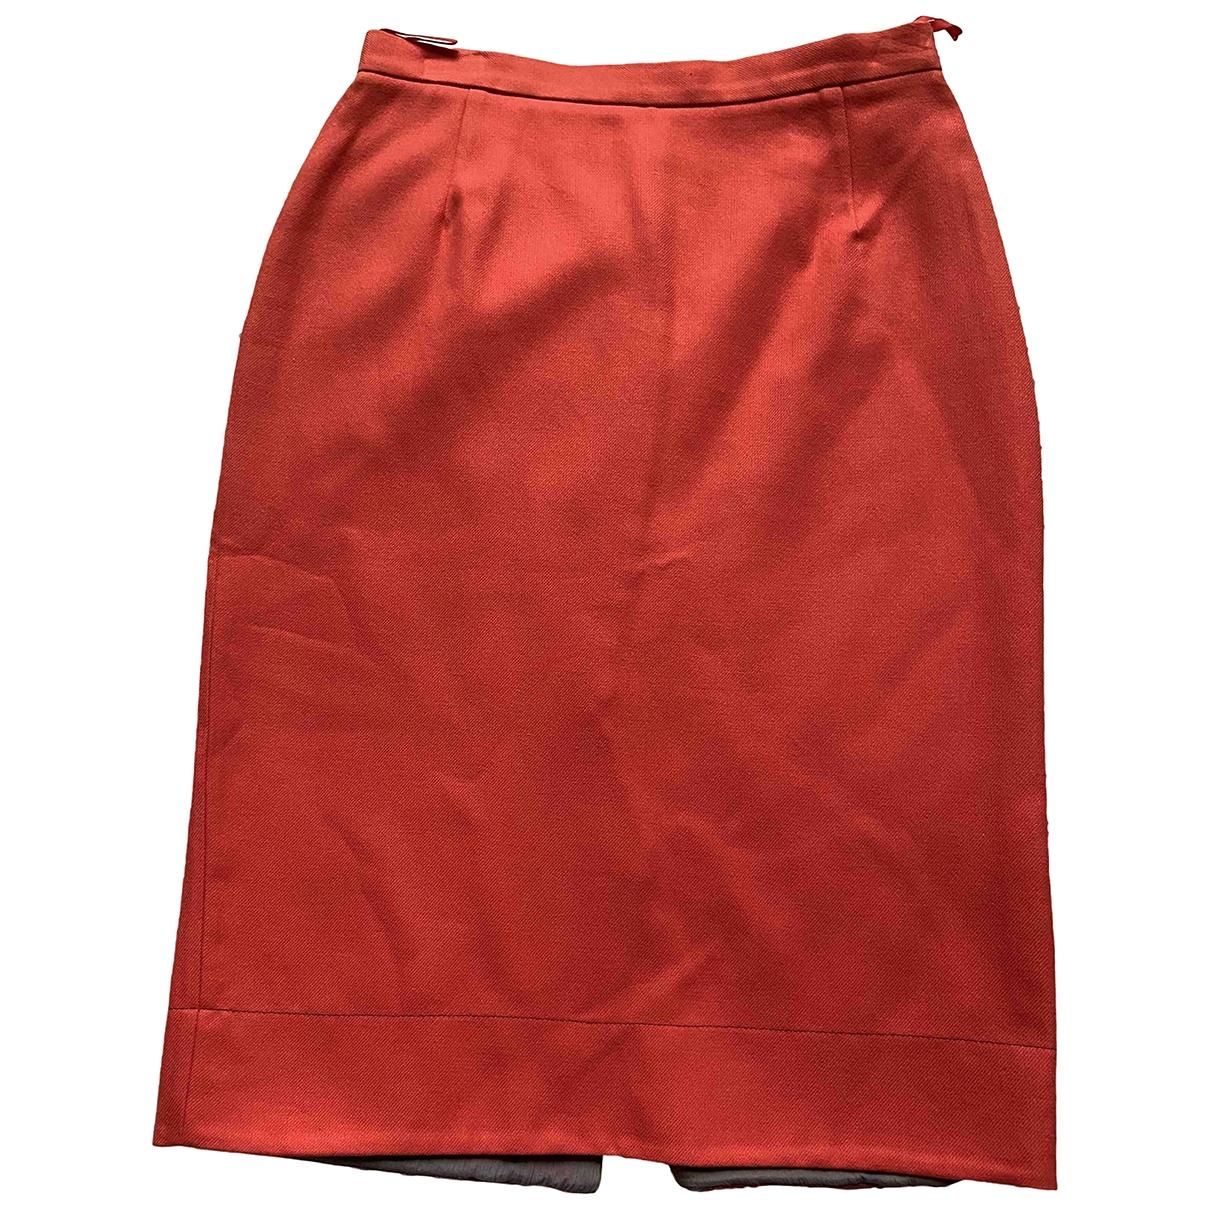 Prada \N Red Cotton skirt for Women 44 IT